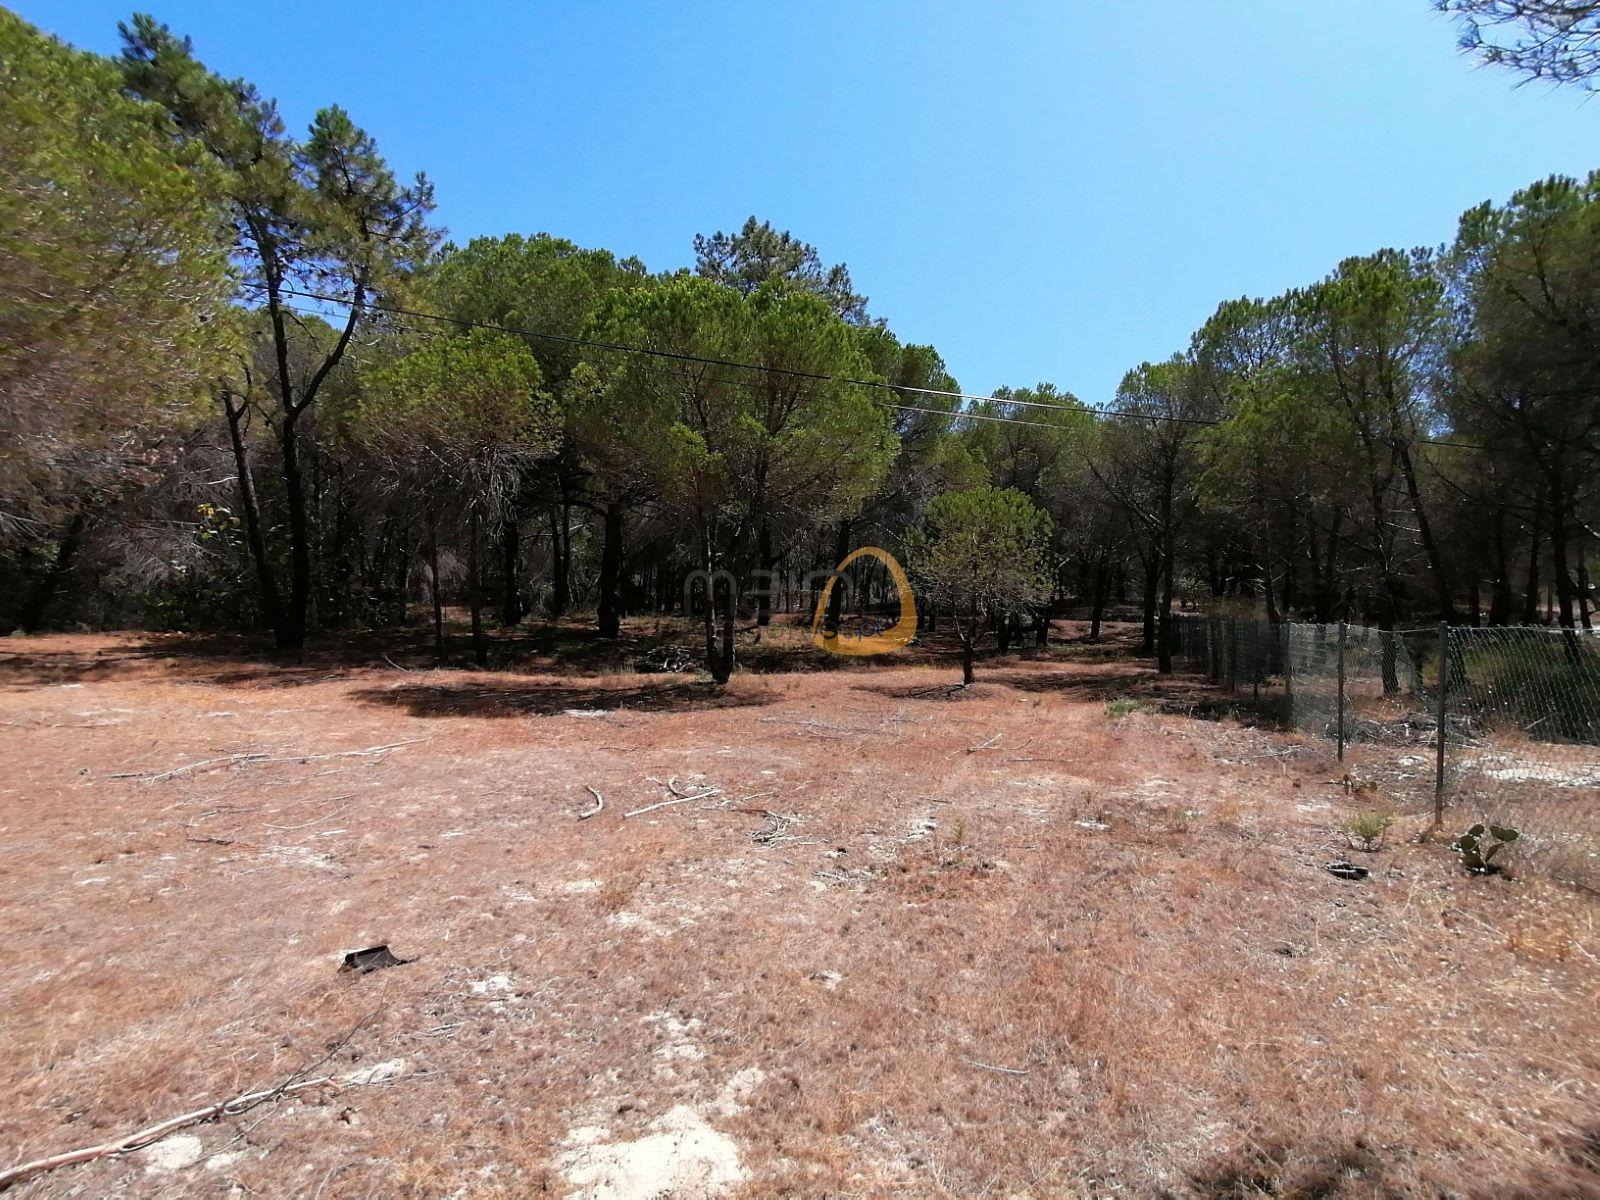 [:pt]Terreno em zona calma próximo de Vale do Lobo PC354[:en]MainProperties :: Flat land in a quiet area near Vale do Lobo :: Land :: PC354[:]